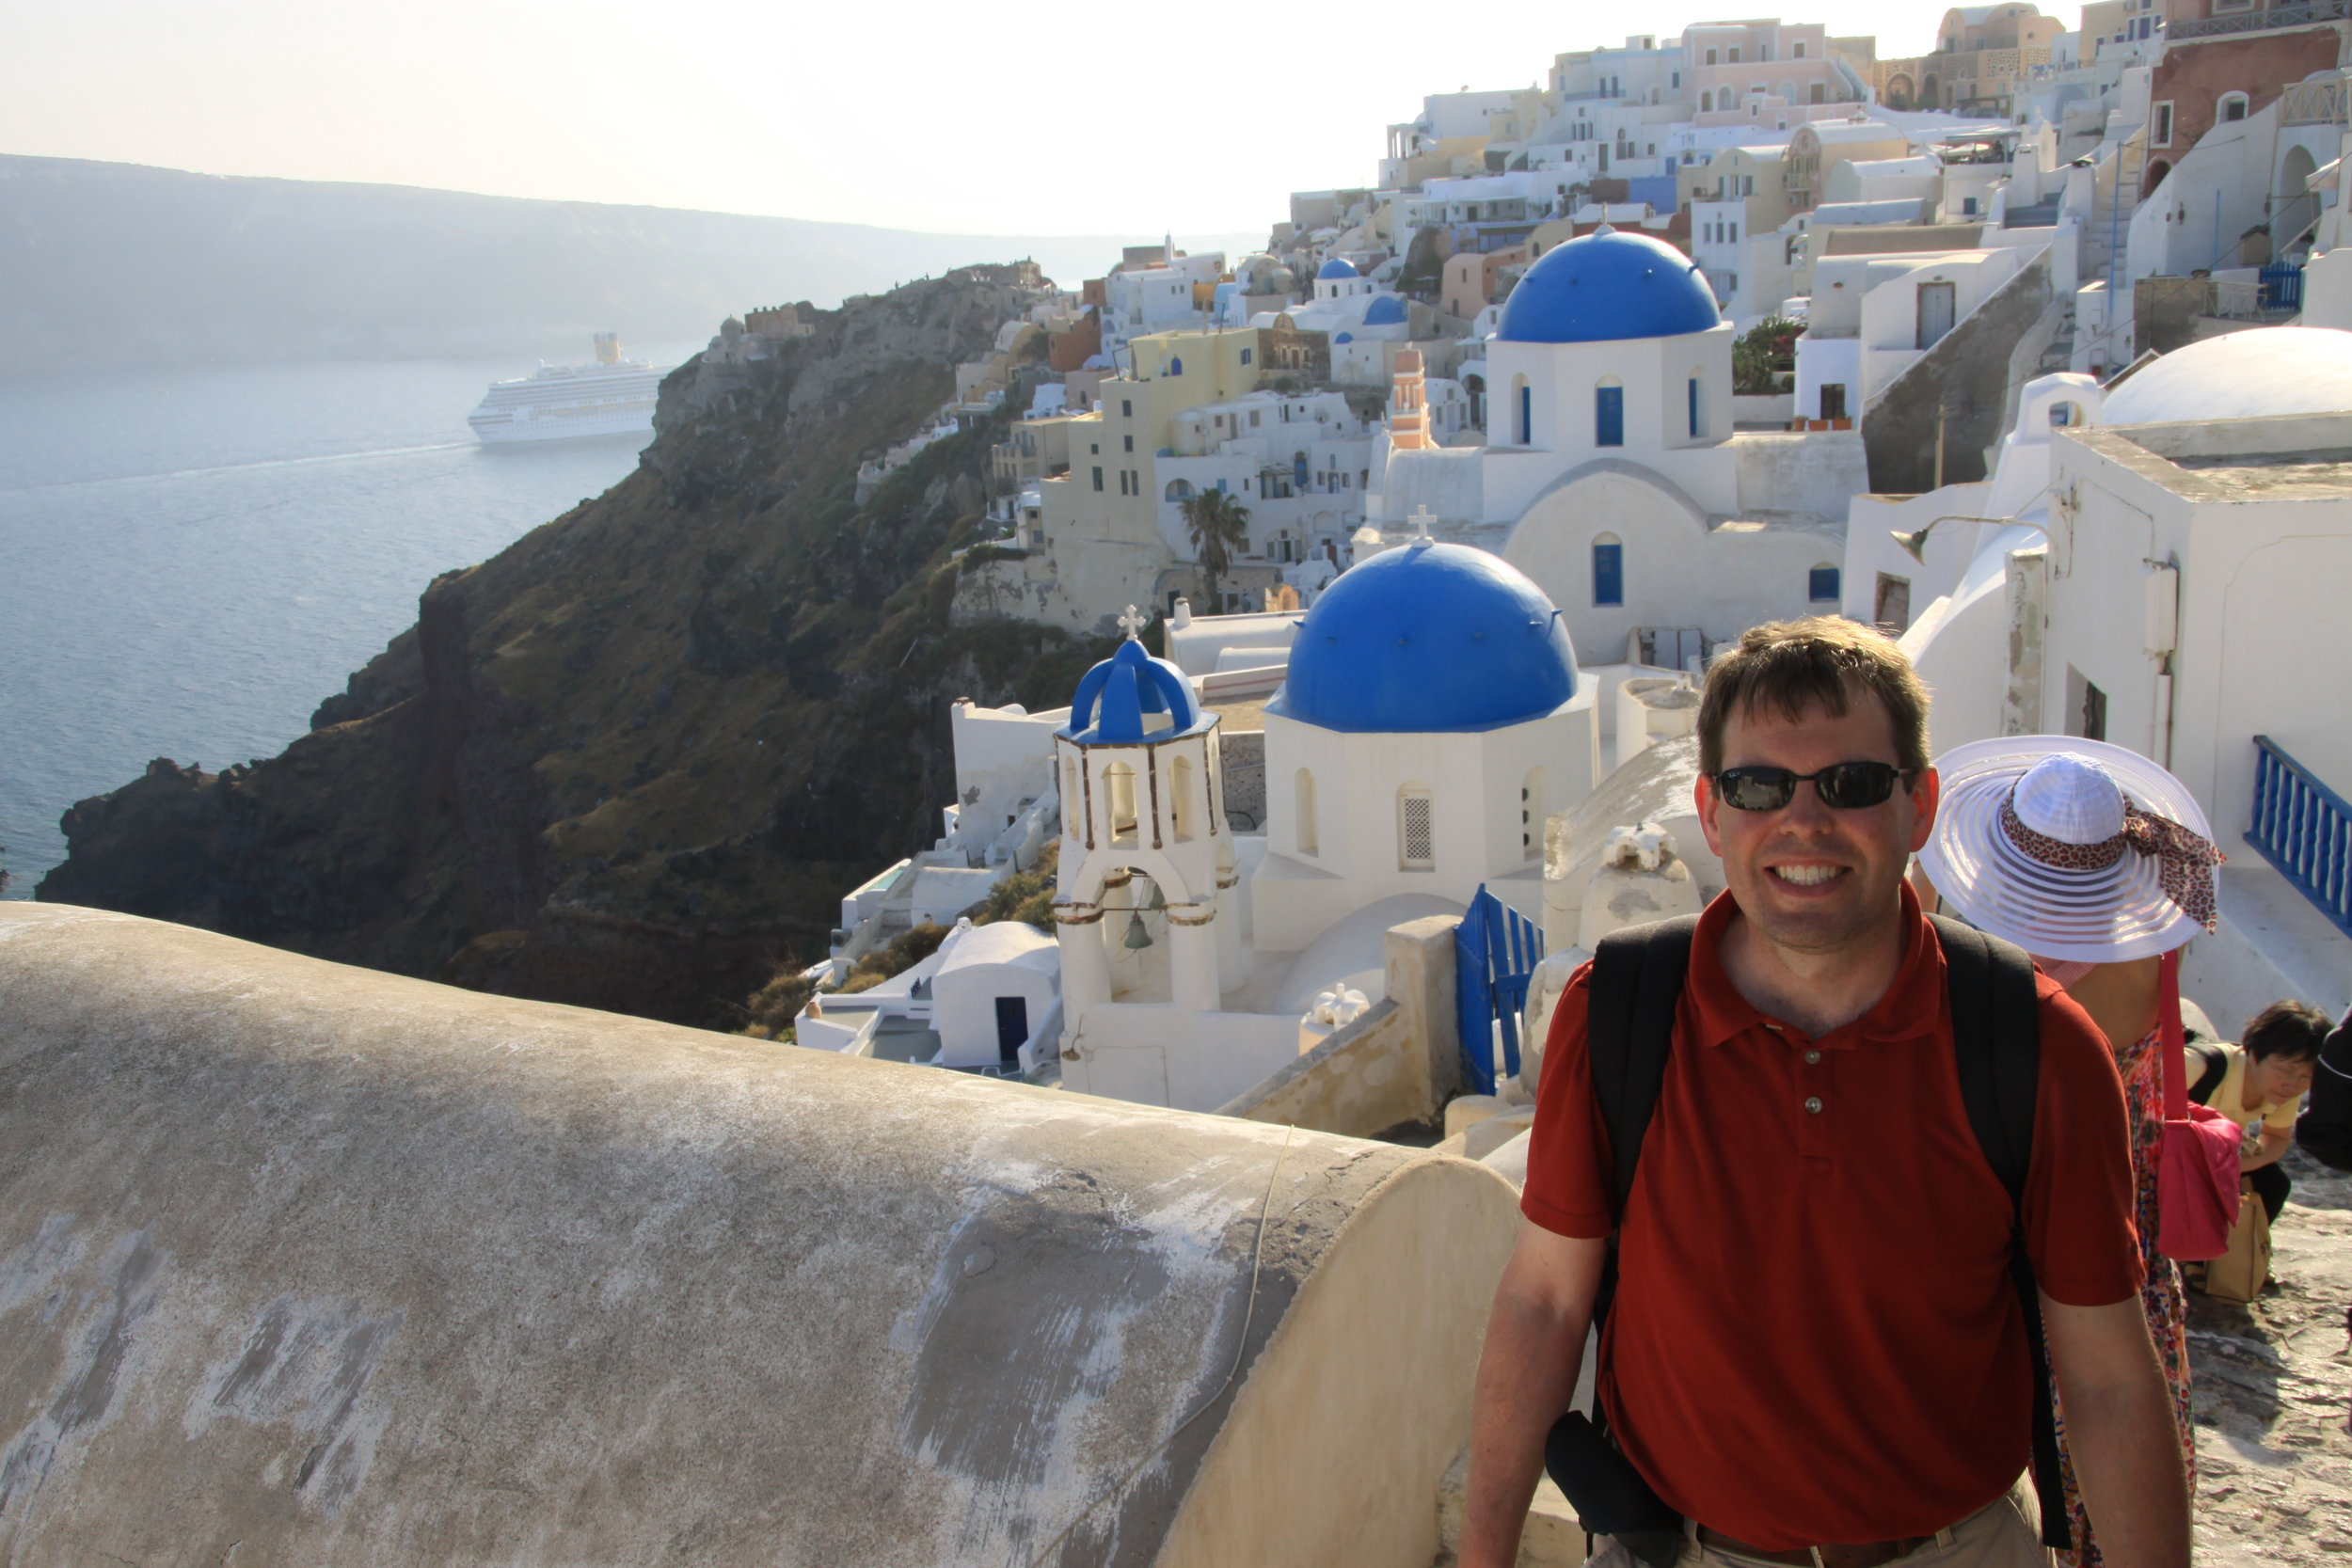 Dan Kingsley, on the beautiful island of Santorini.